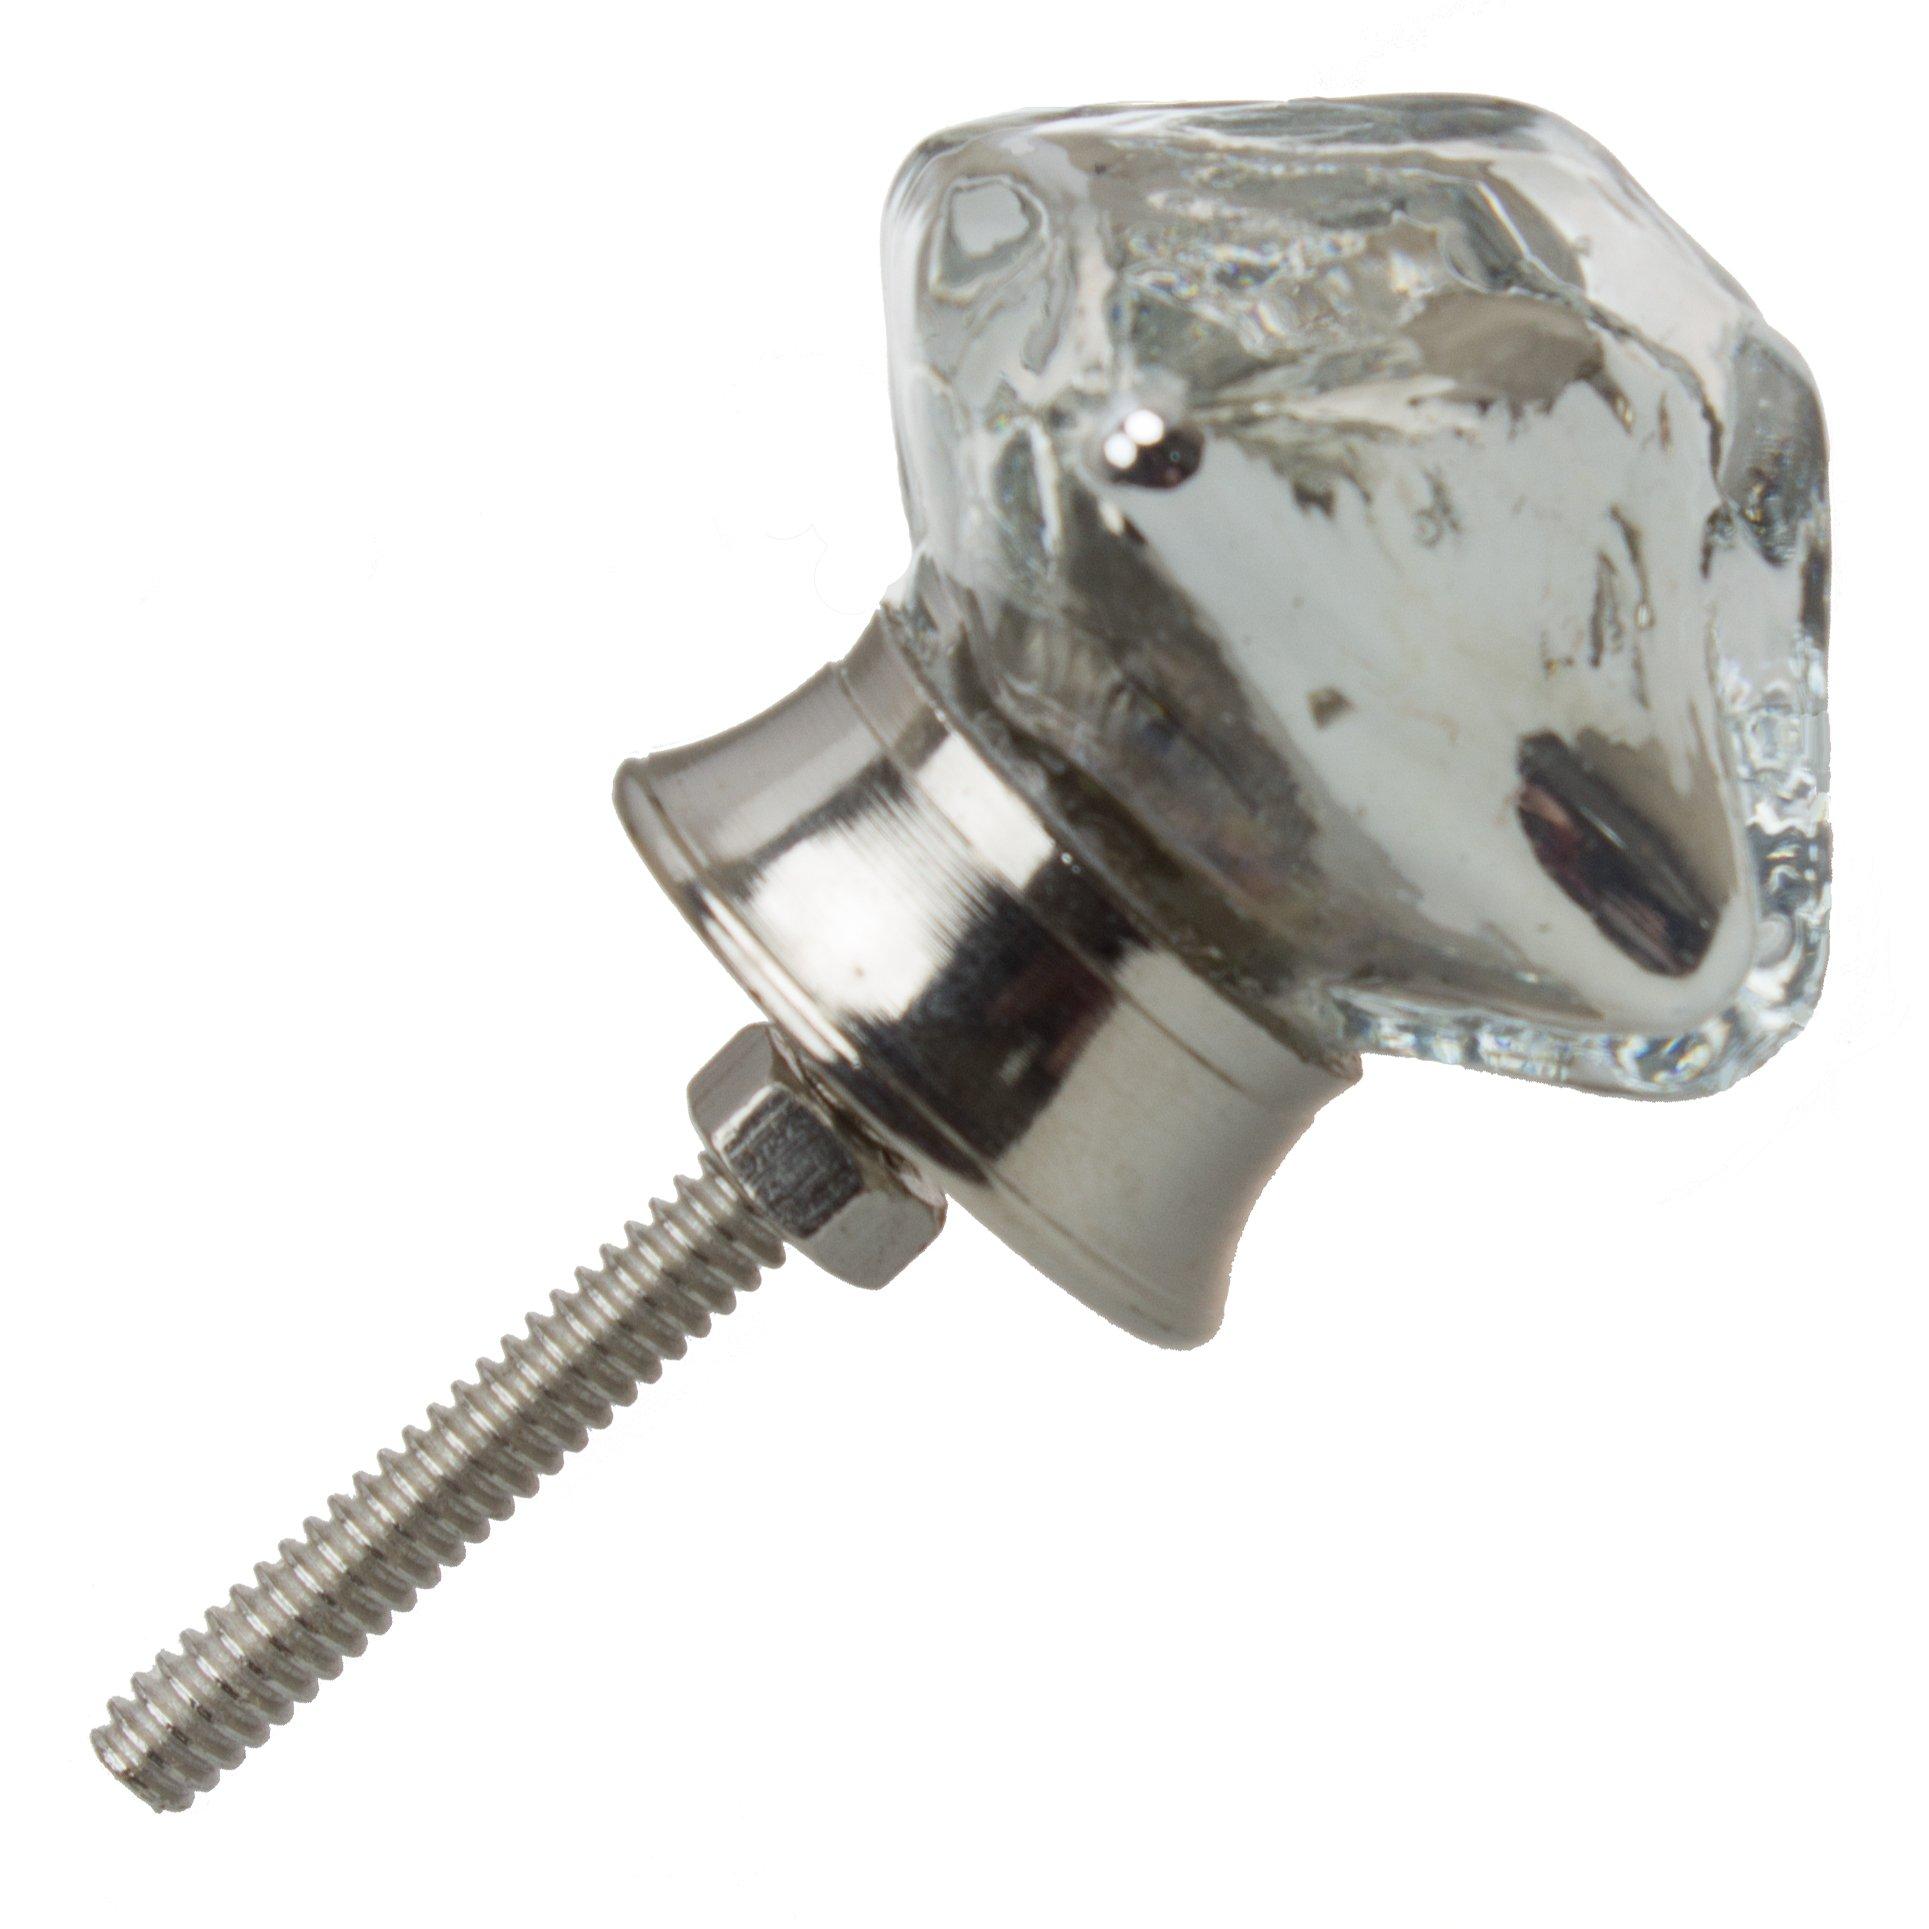 GlideRite Hardware 231010-M-25 Pyramid Mercury Glass Cabinet Knobs, 25 Pack, 1.25'', Silver Vintage Mercury Glass by GlideRite Hardware (Image #2)